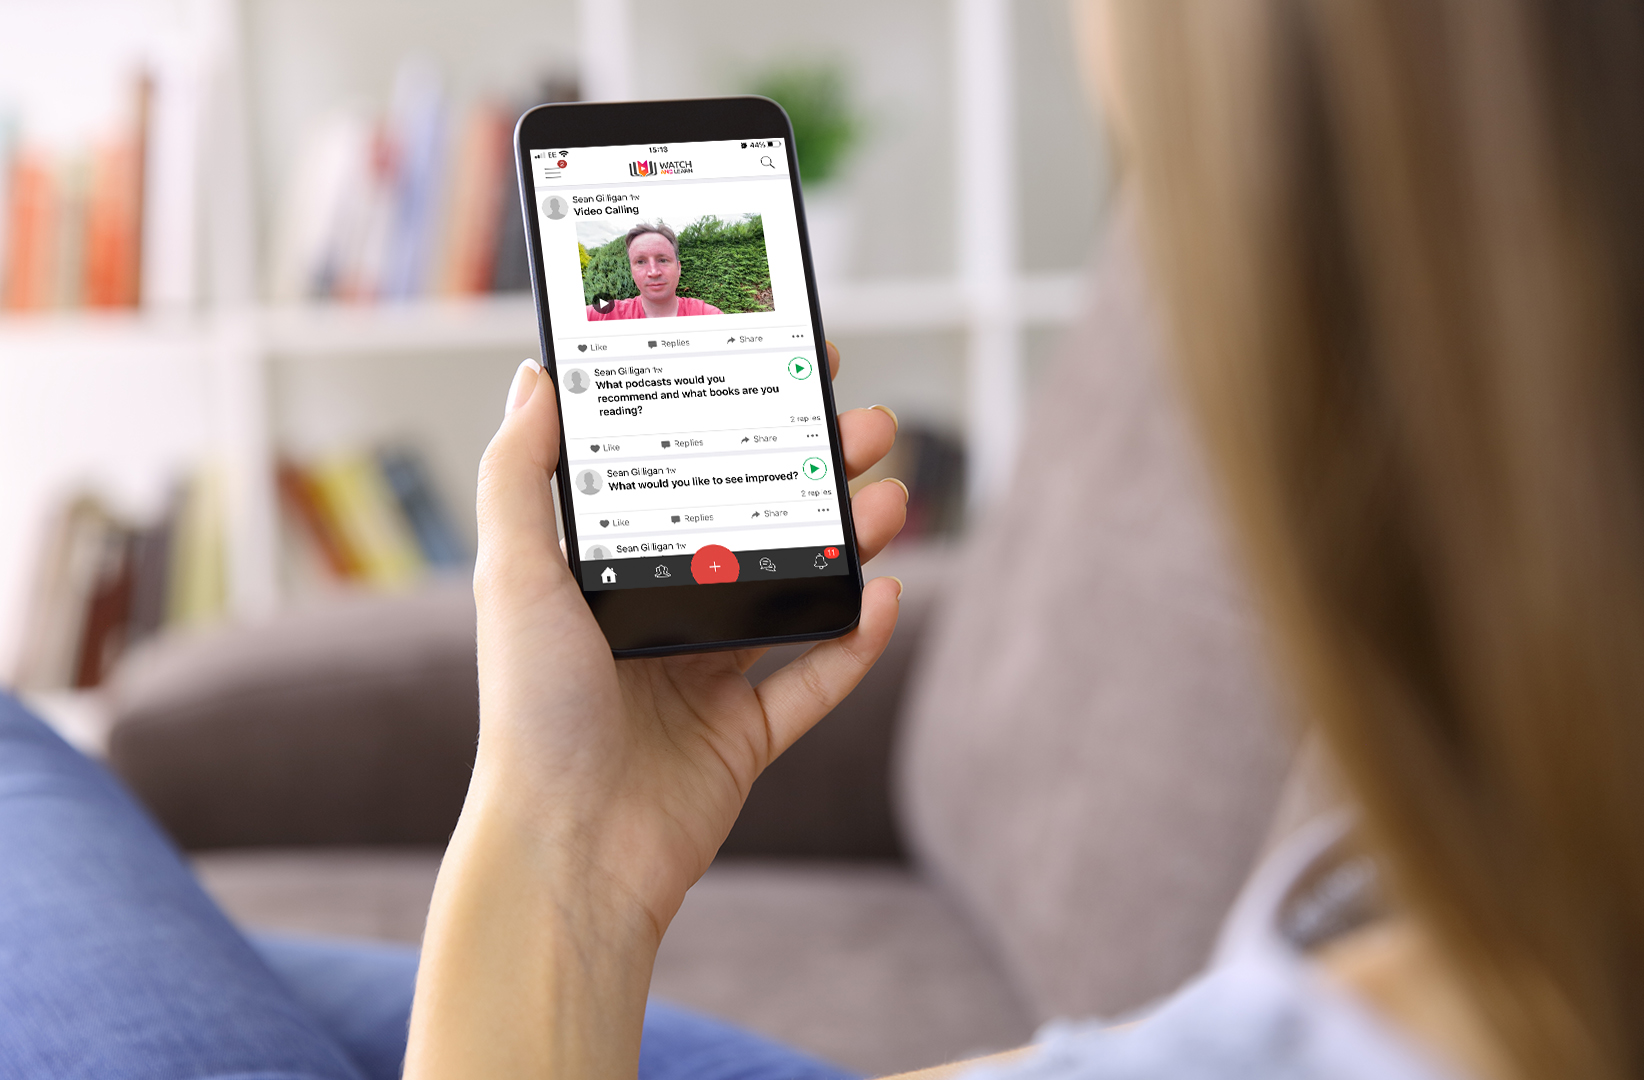 Remote video calling